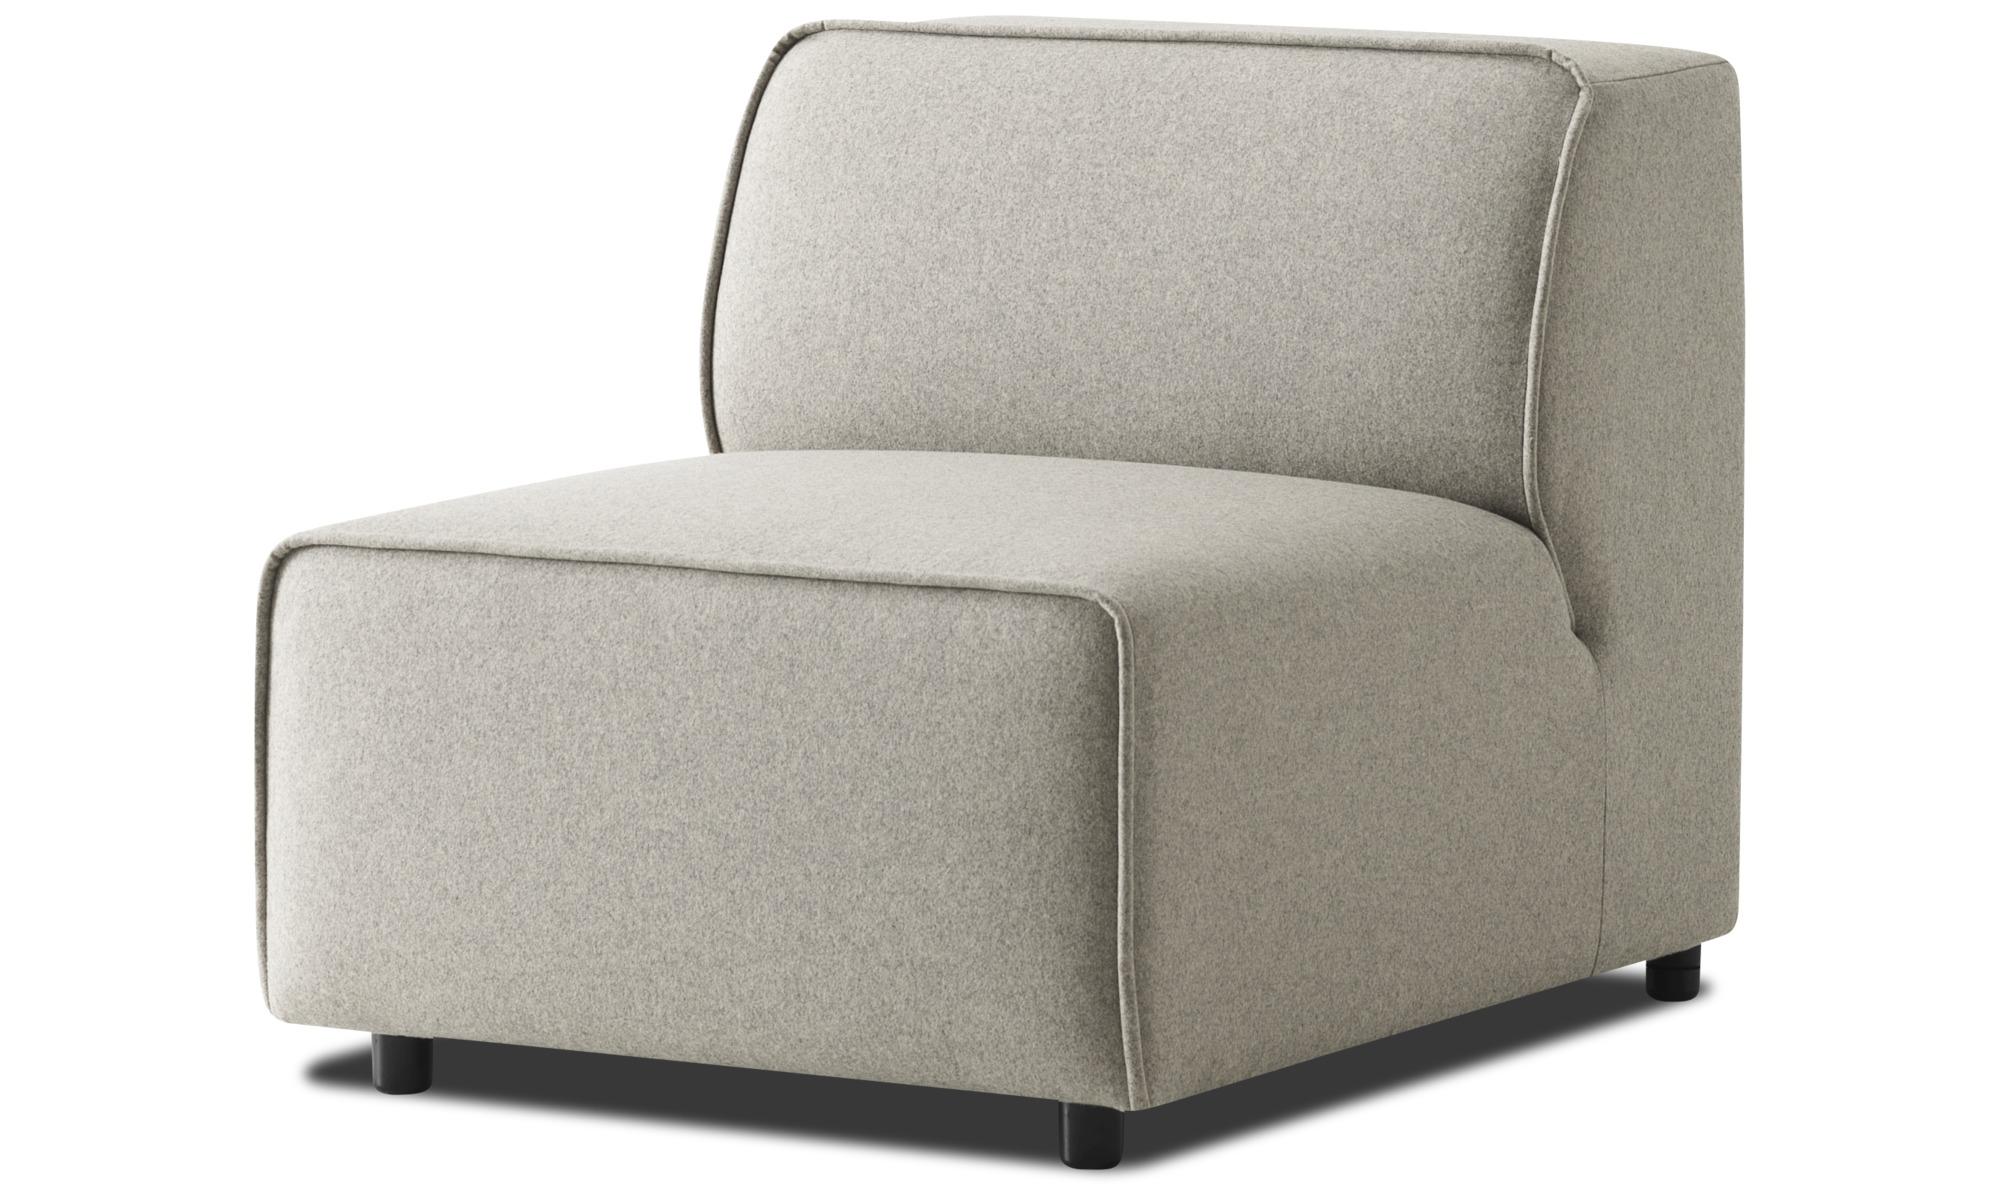 Modular sofas Carmo chairbasic unit BoConcept